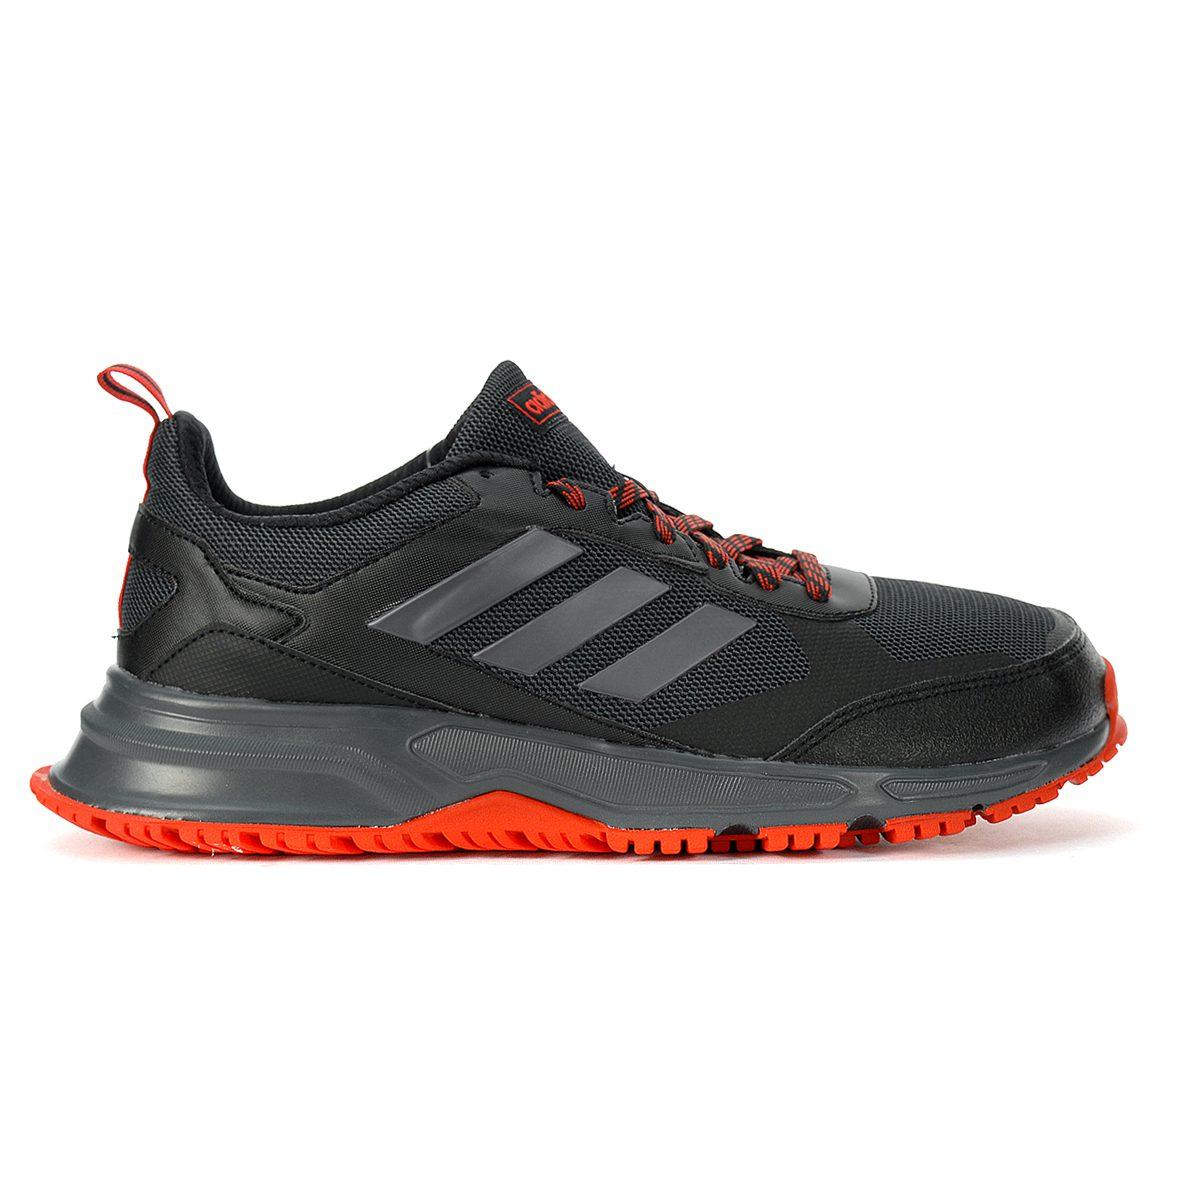 marzo tal vez Realista  Adidas Men's Rockadia 3.0 (Wide) Core Black/Night Metallic/Active Red Trail  S... | eBay